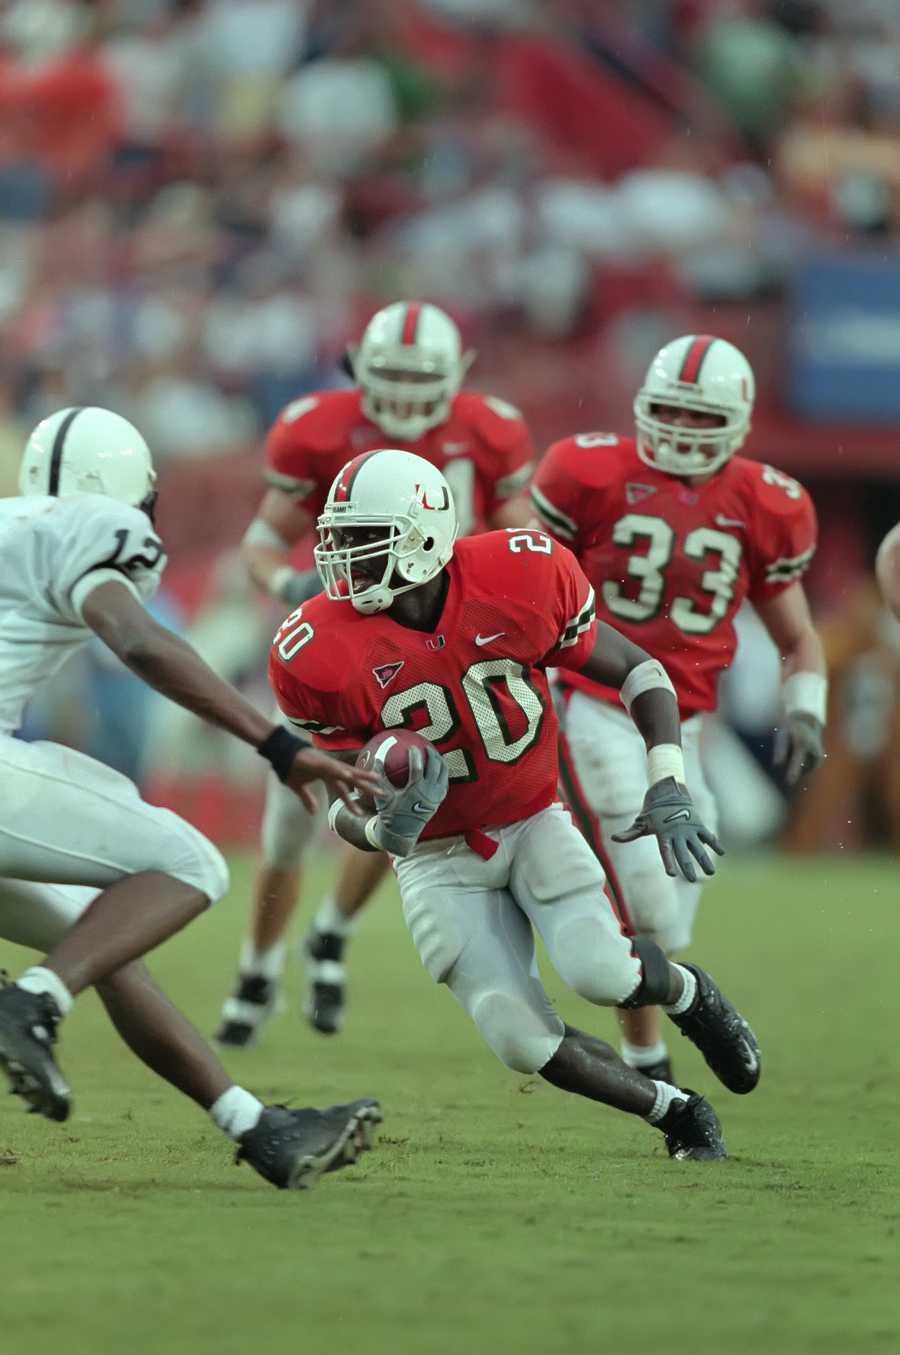 6. Ed Reed, S, Miami (1997-2001)